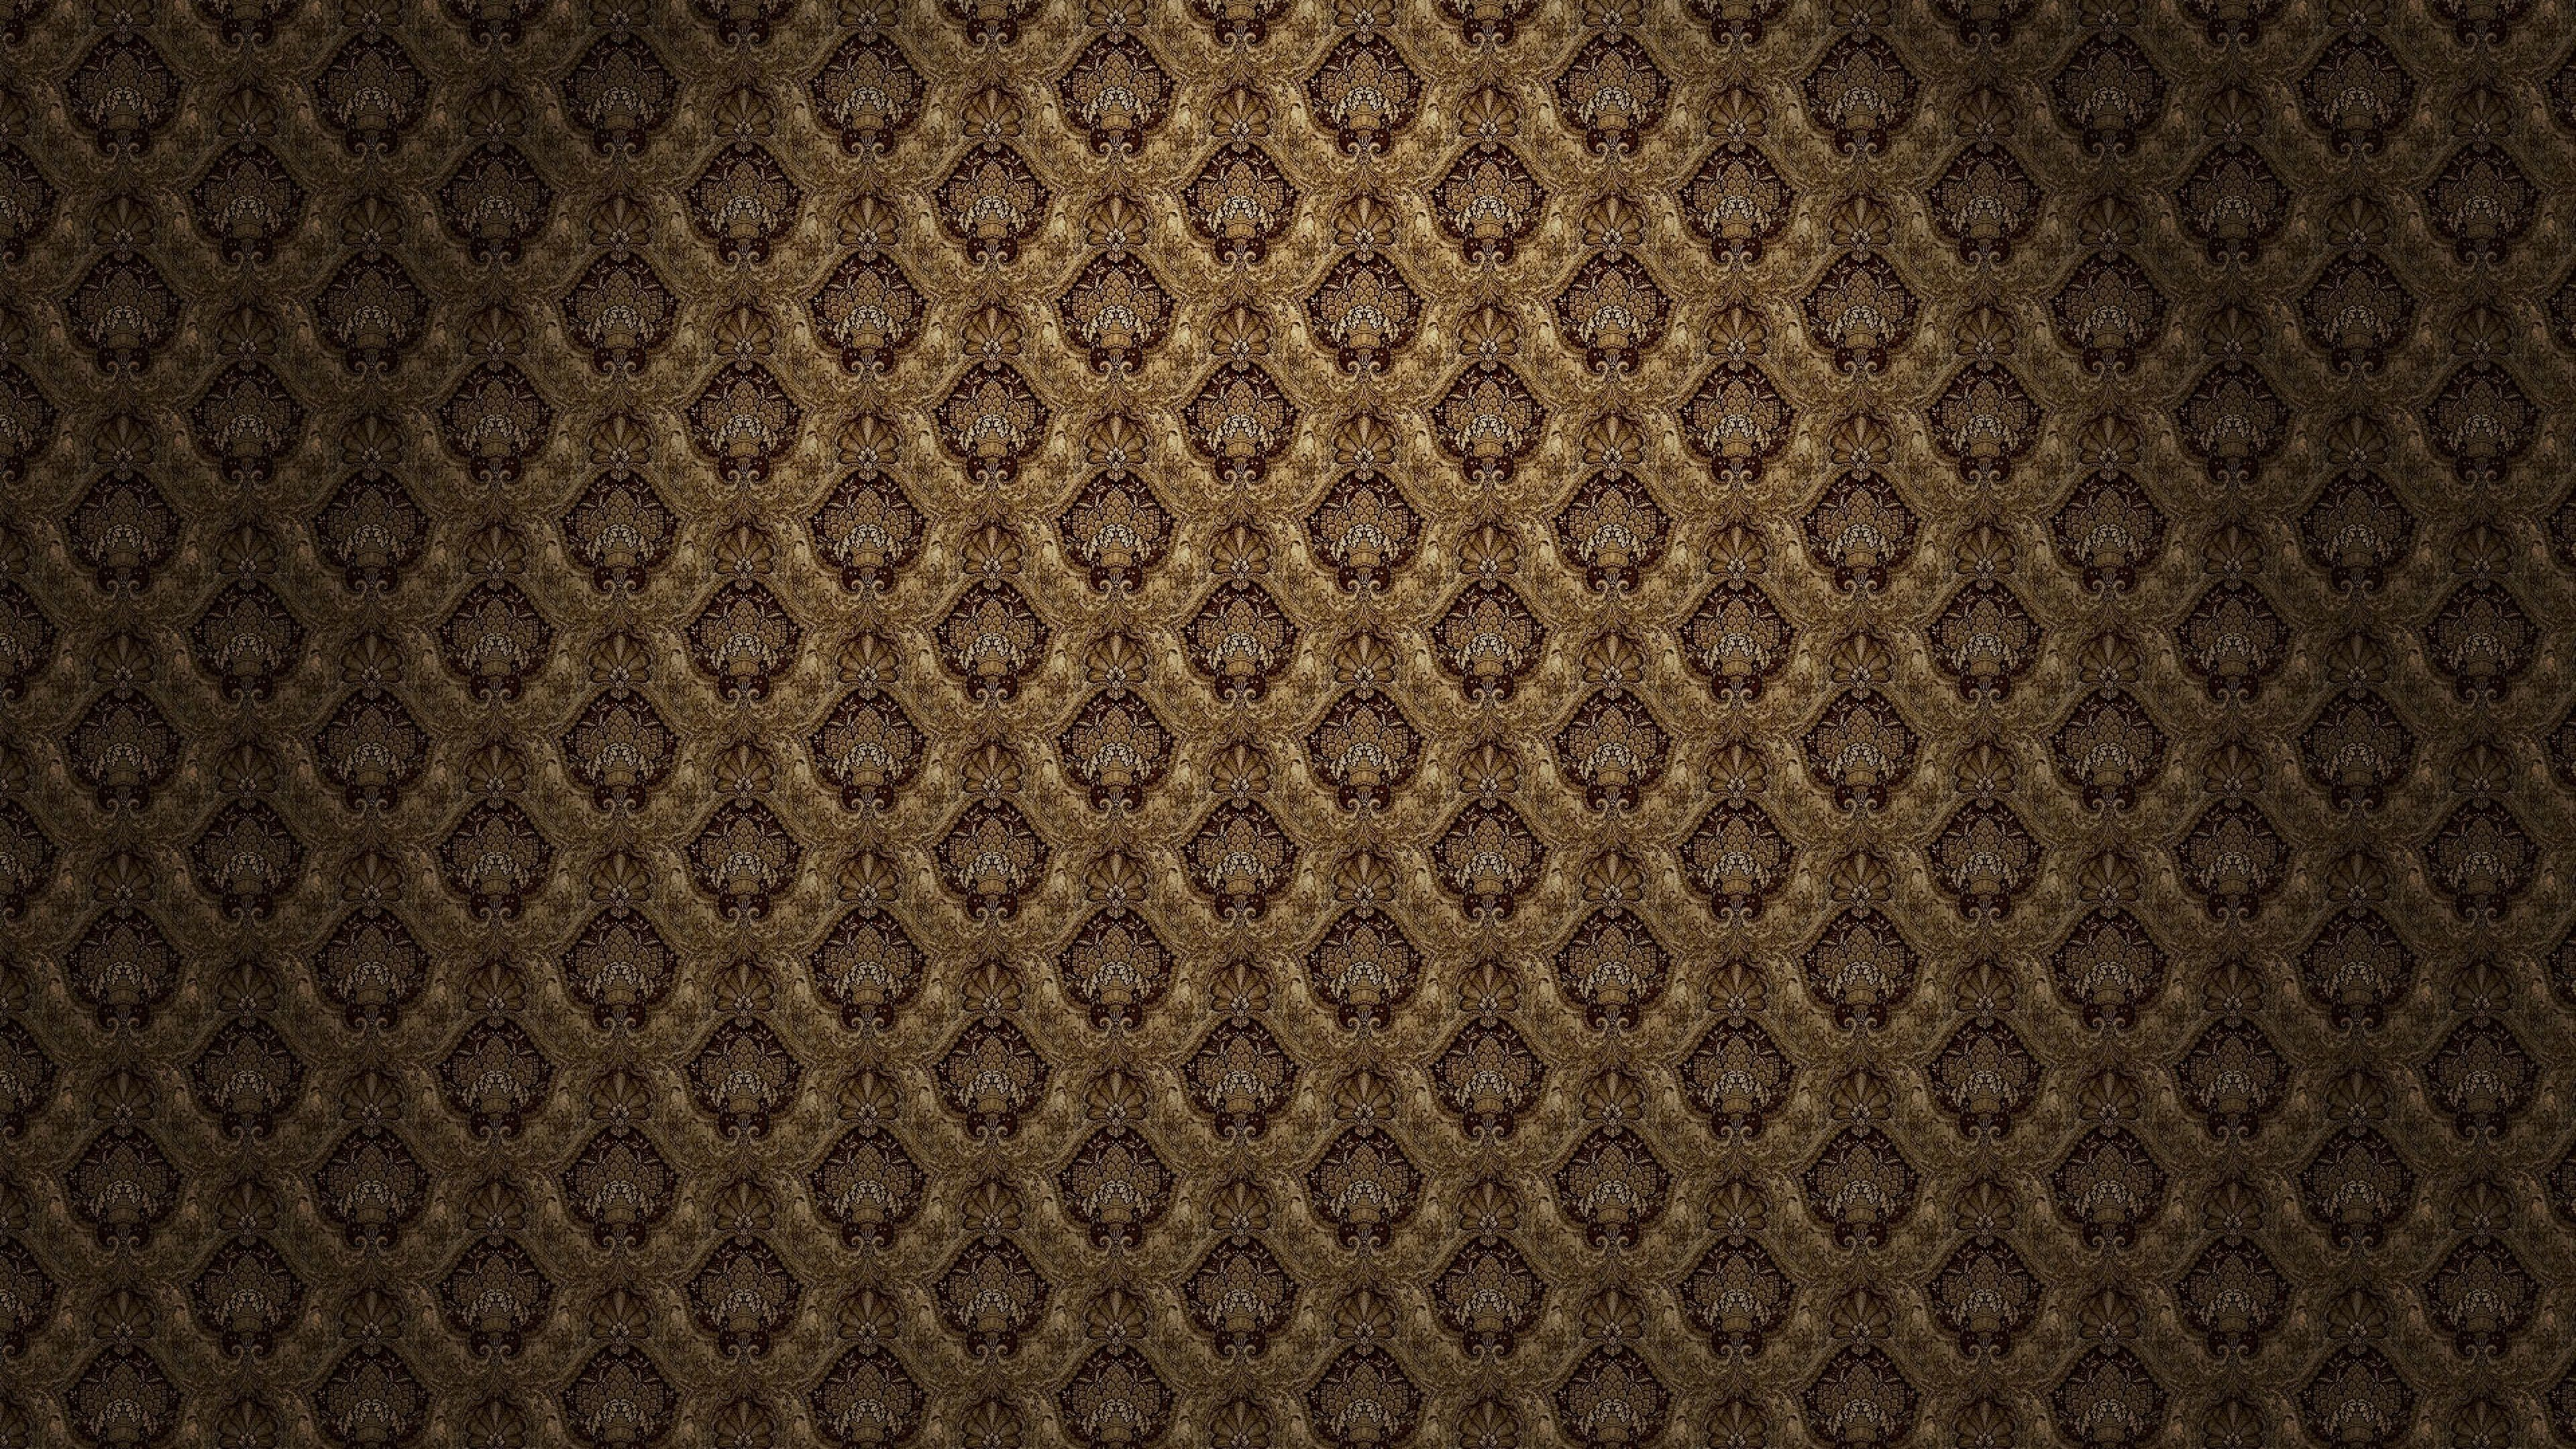 4k Vintage Wallpaper Hd Wallpaper Free Download 3 Hd Wallpapers